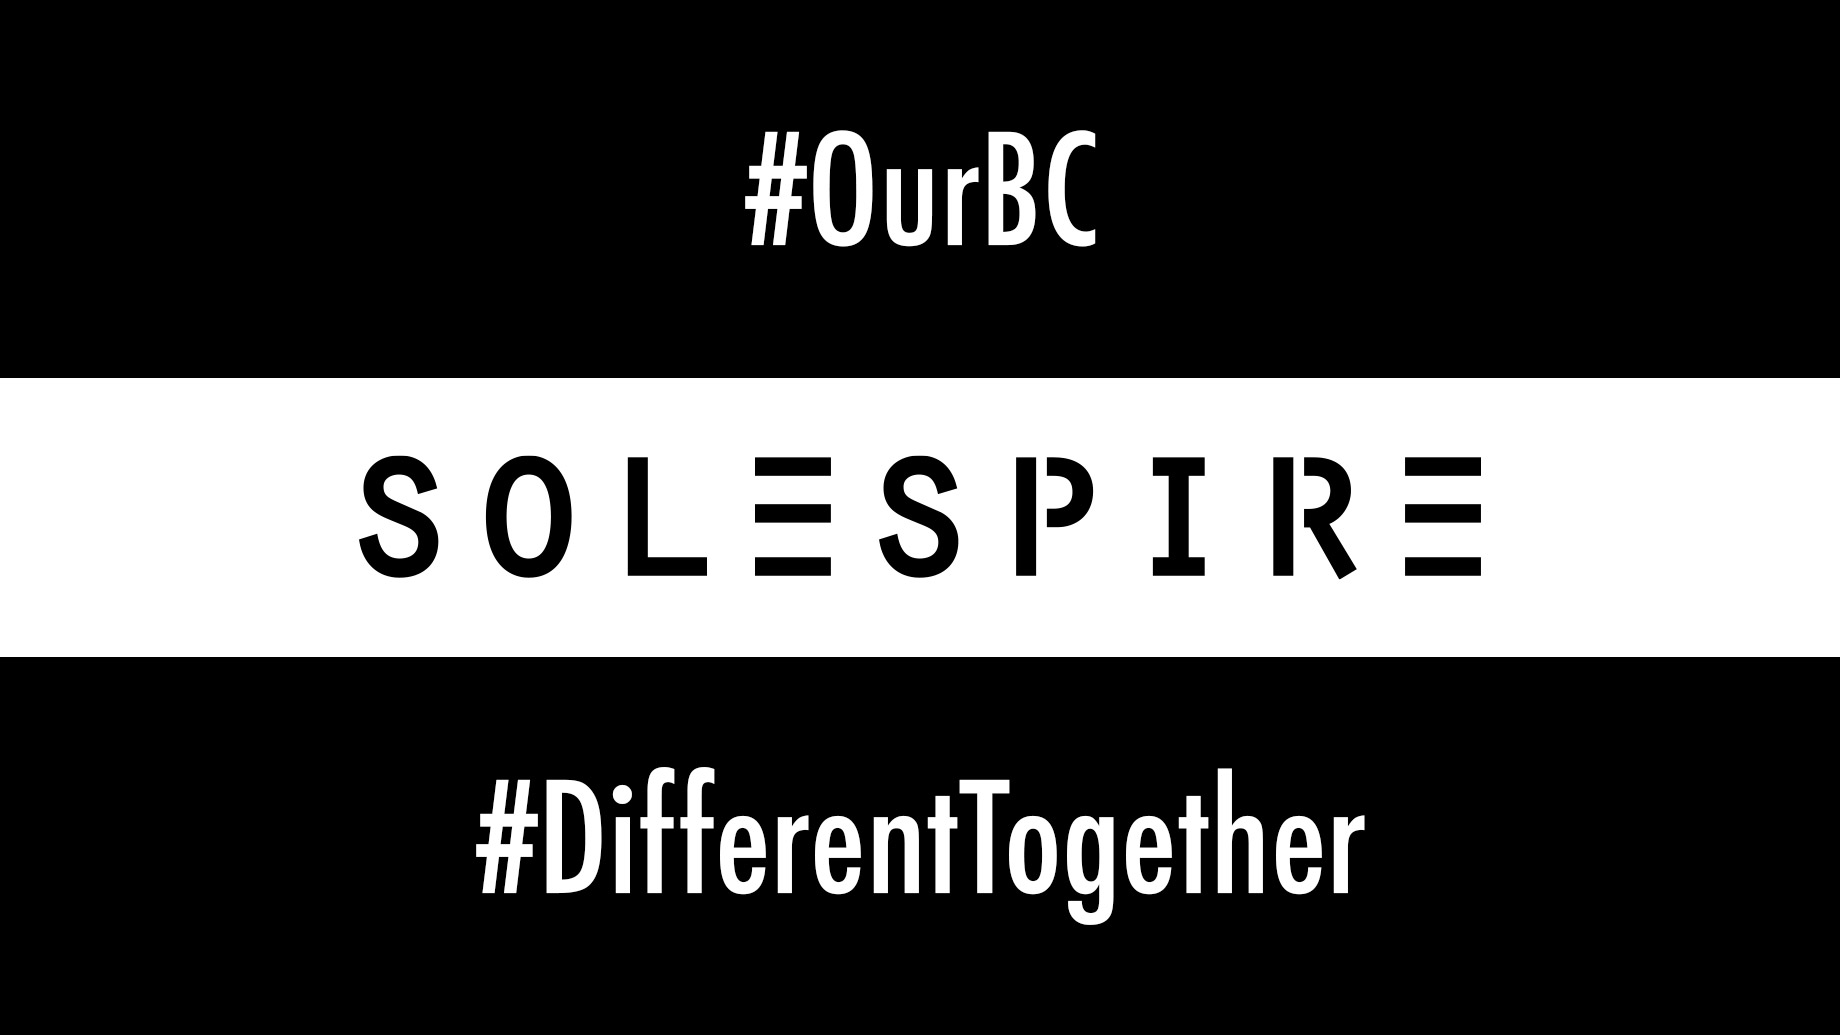 Solespire - #OurBC - #DifferentTogether